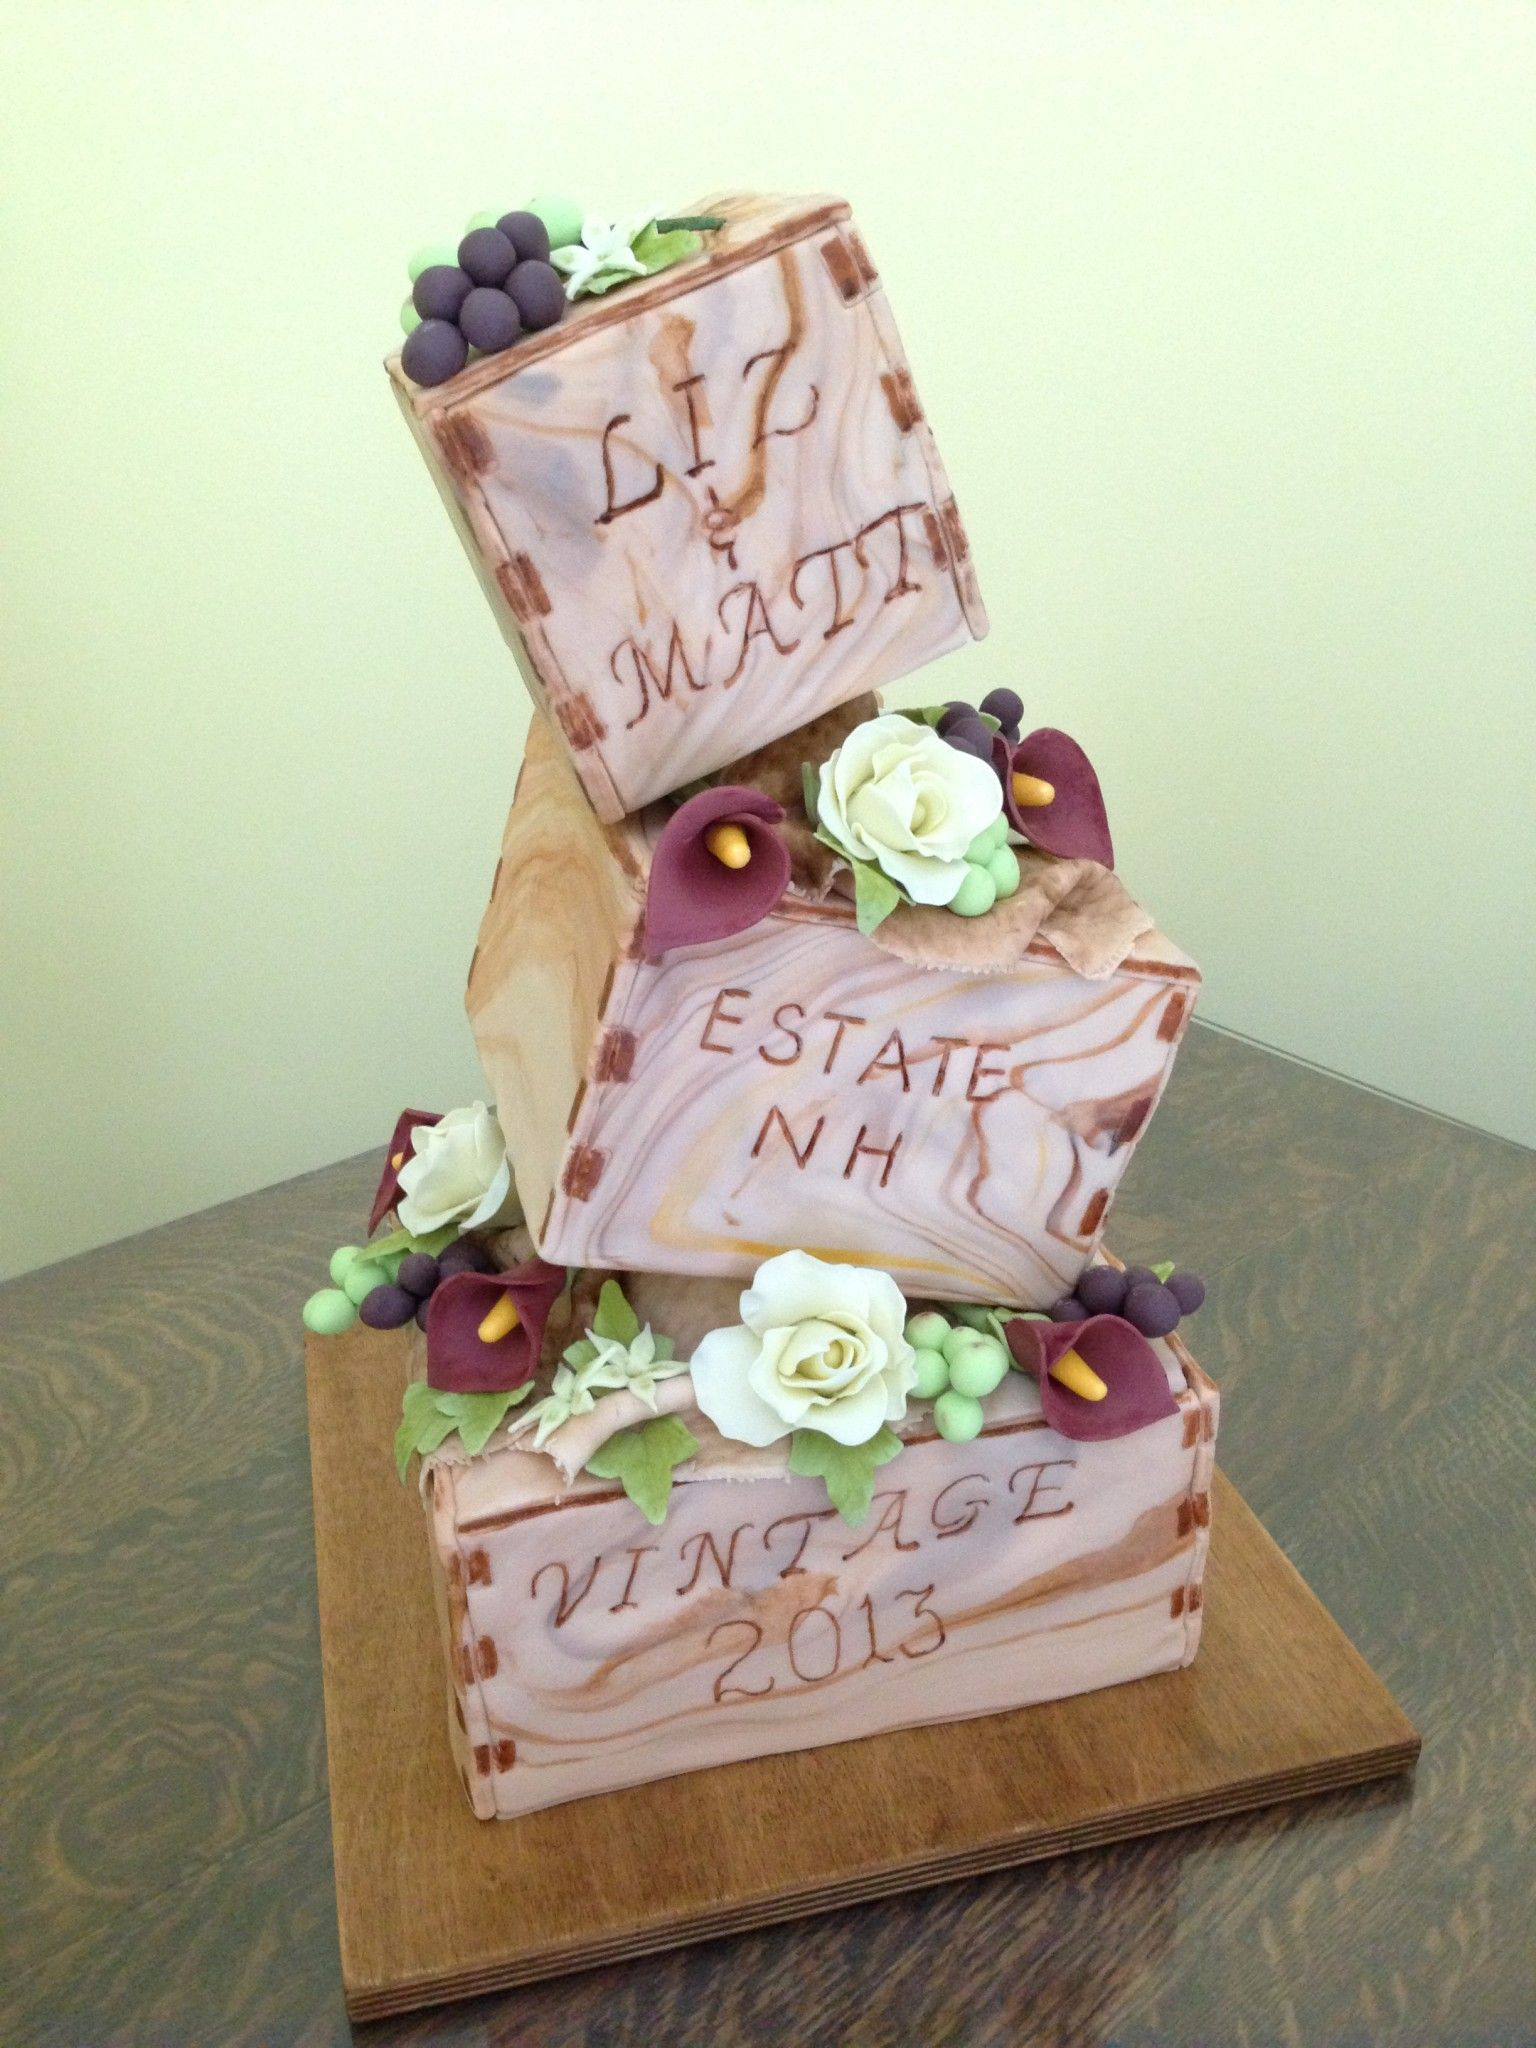 Wedding Cakes Archives - MasterPieces Cake Art